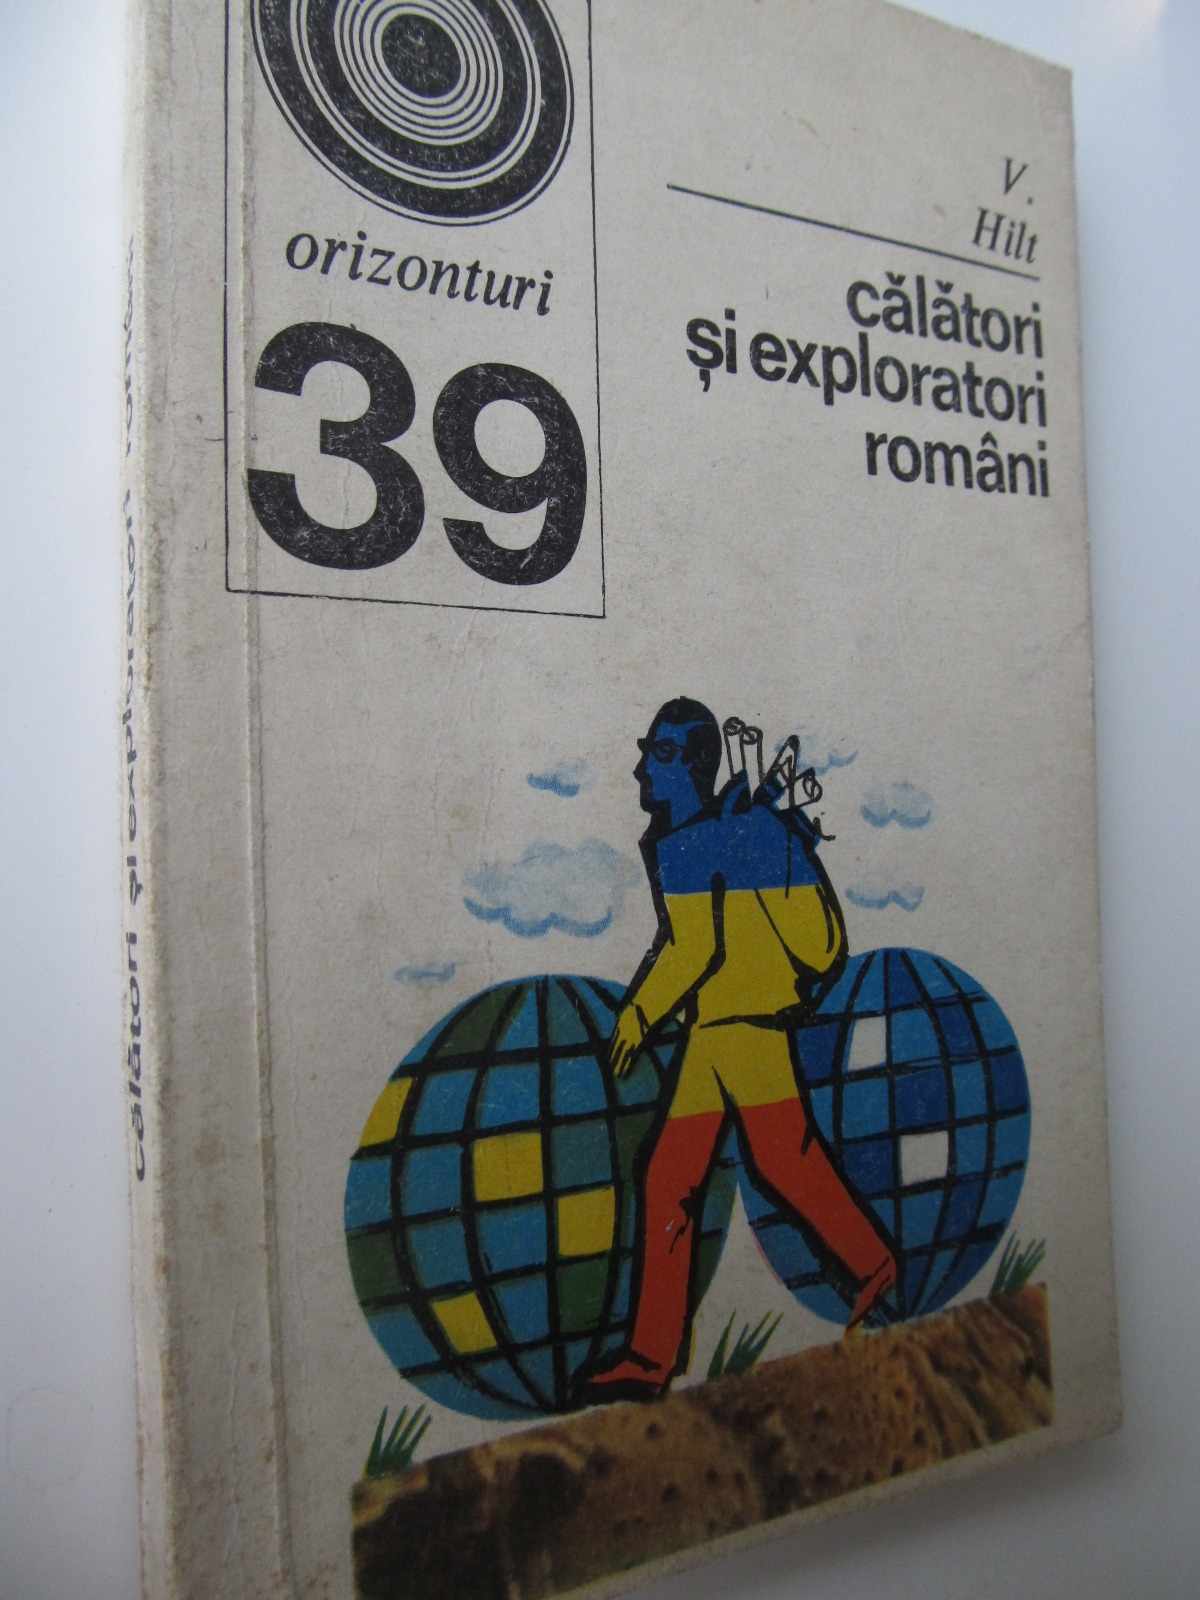 Carte Calatori si exploratori romani (39) - V. Hilt